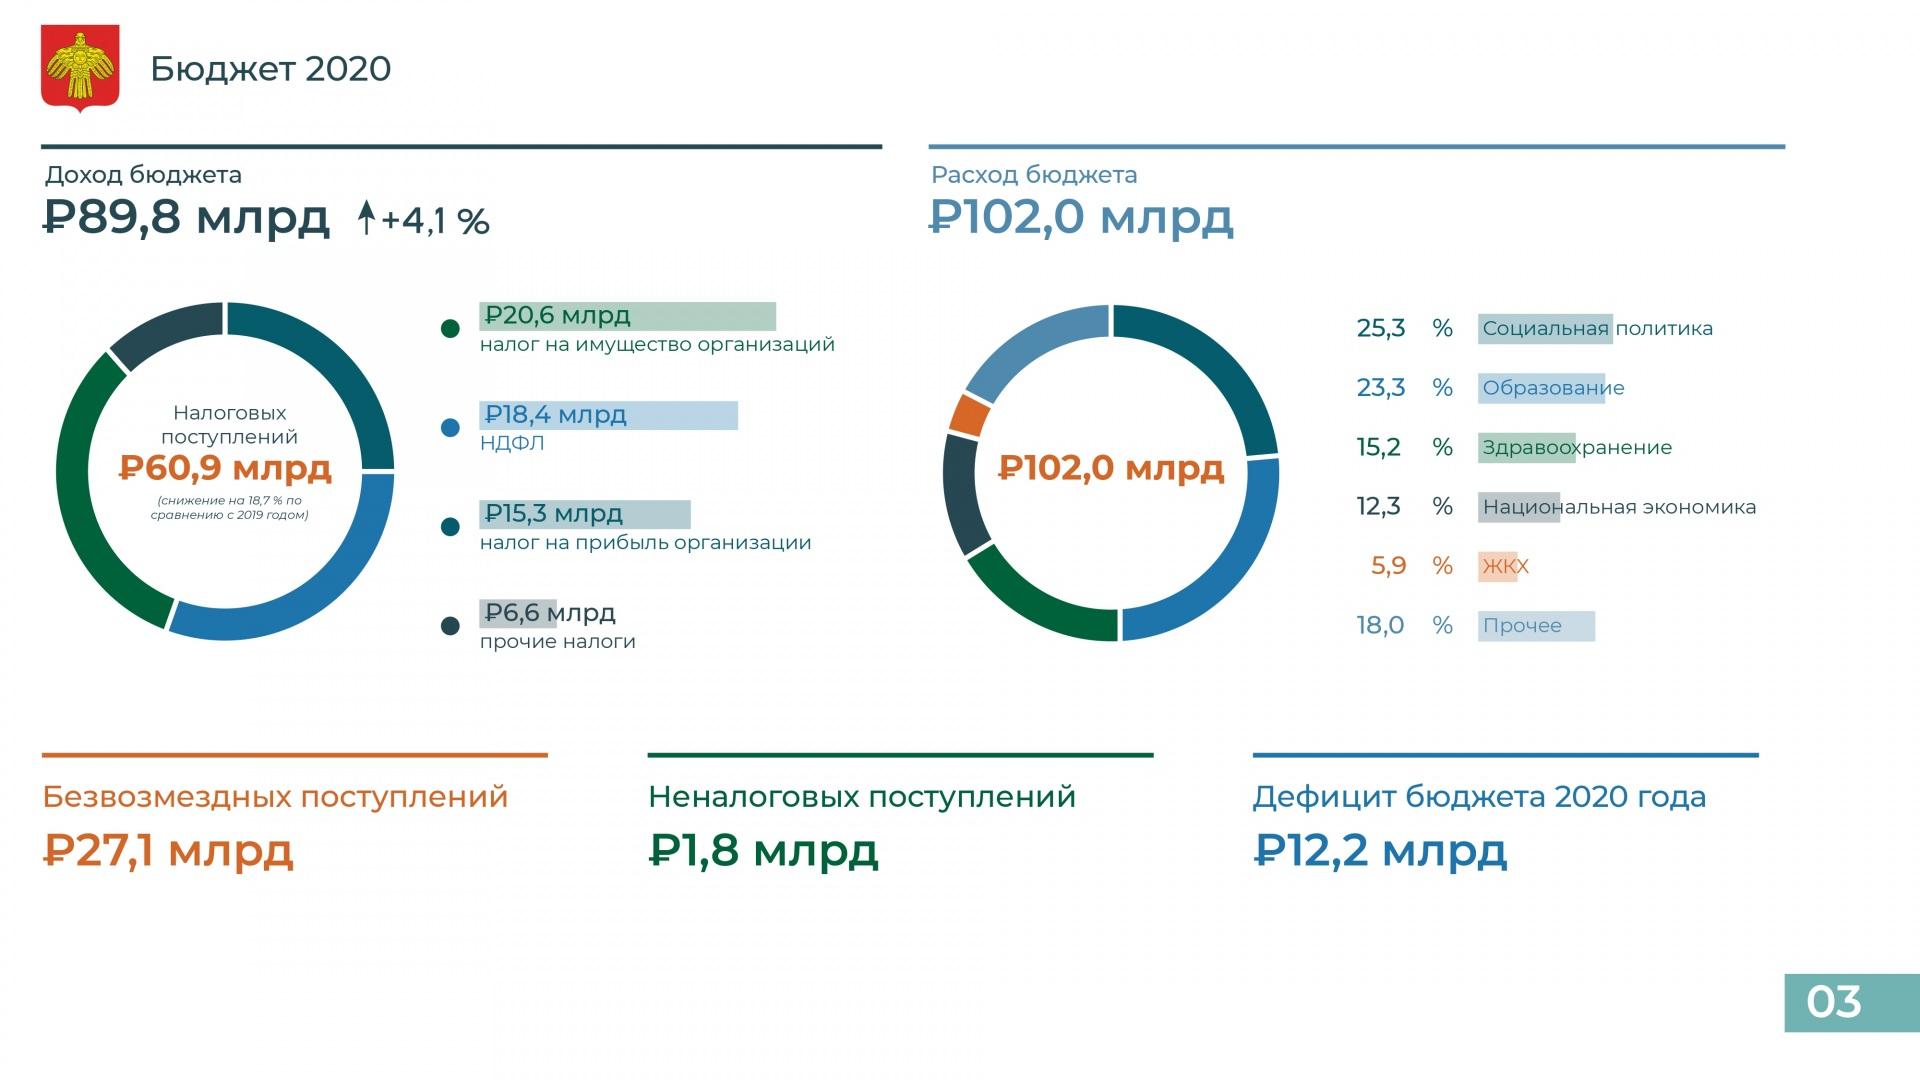 Doklad_Glavy_2021_page-0003.jpg